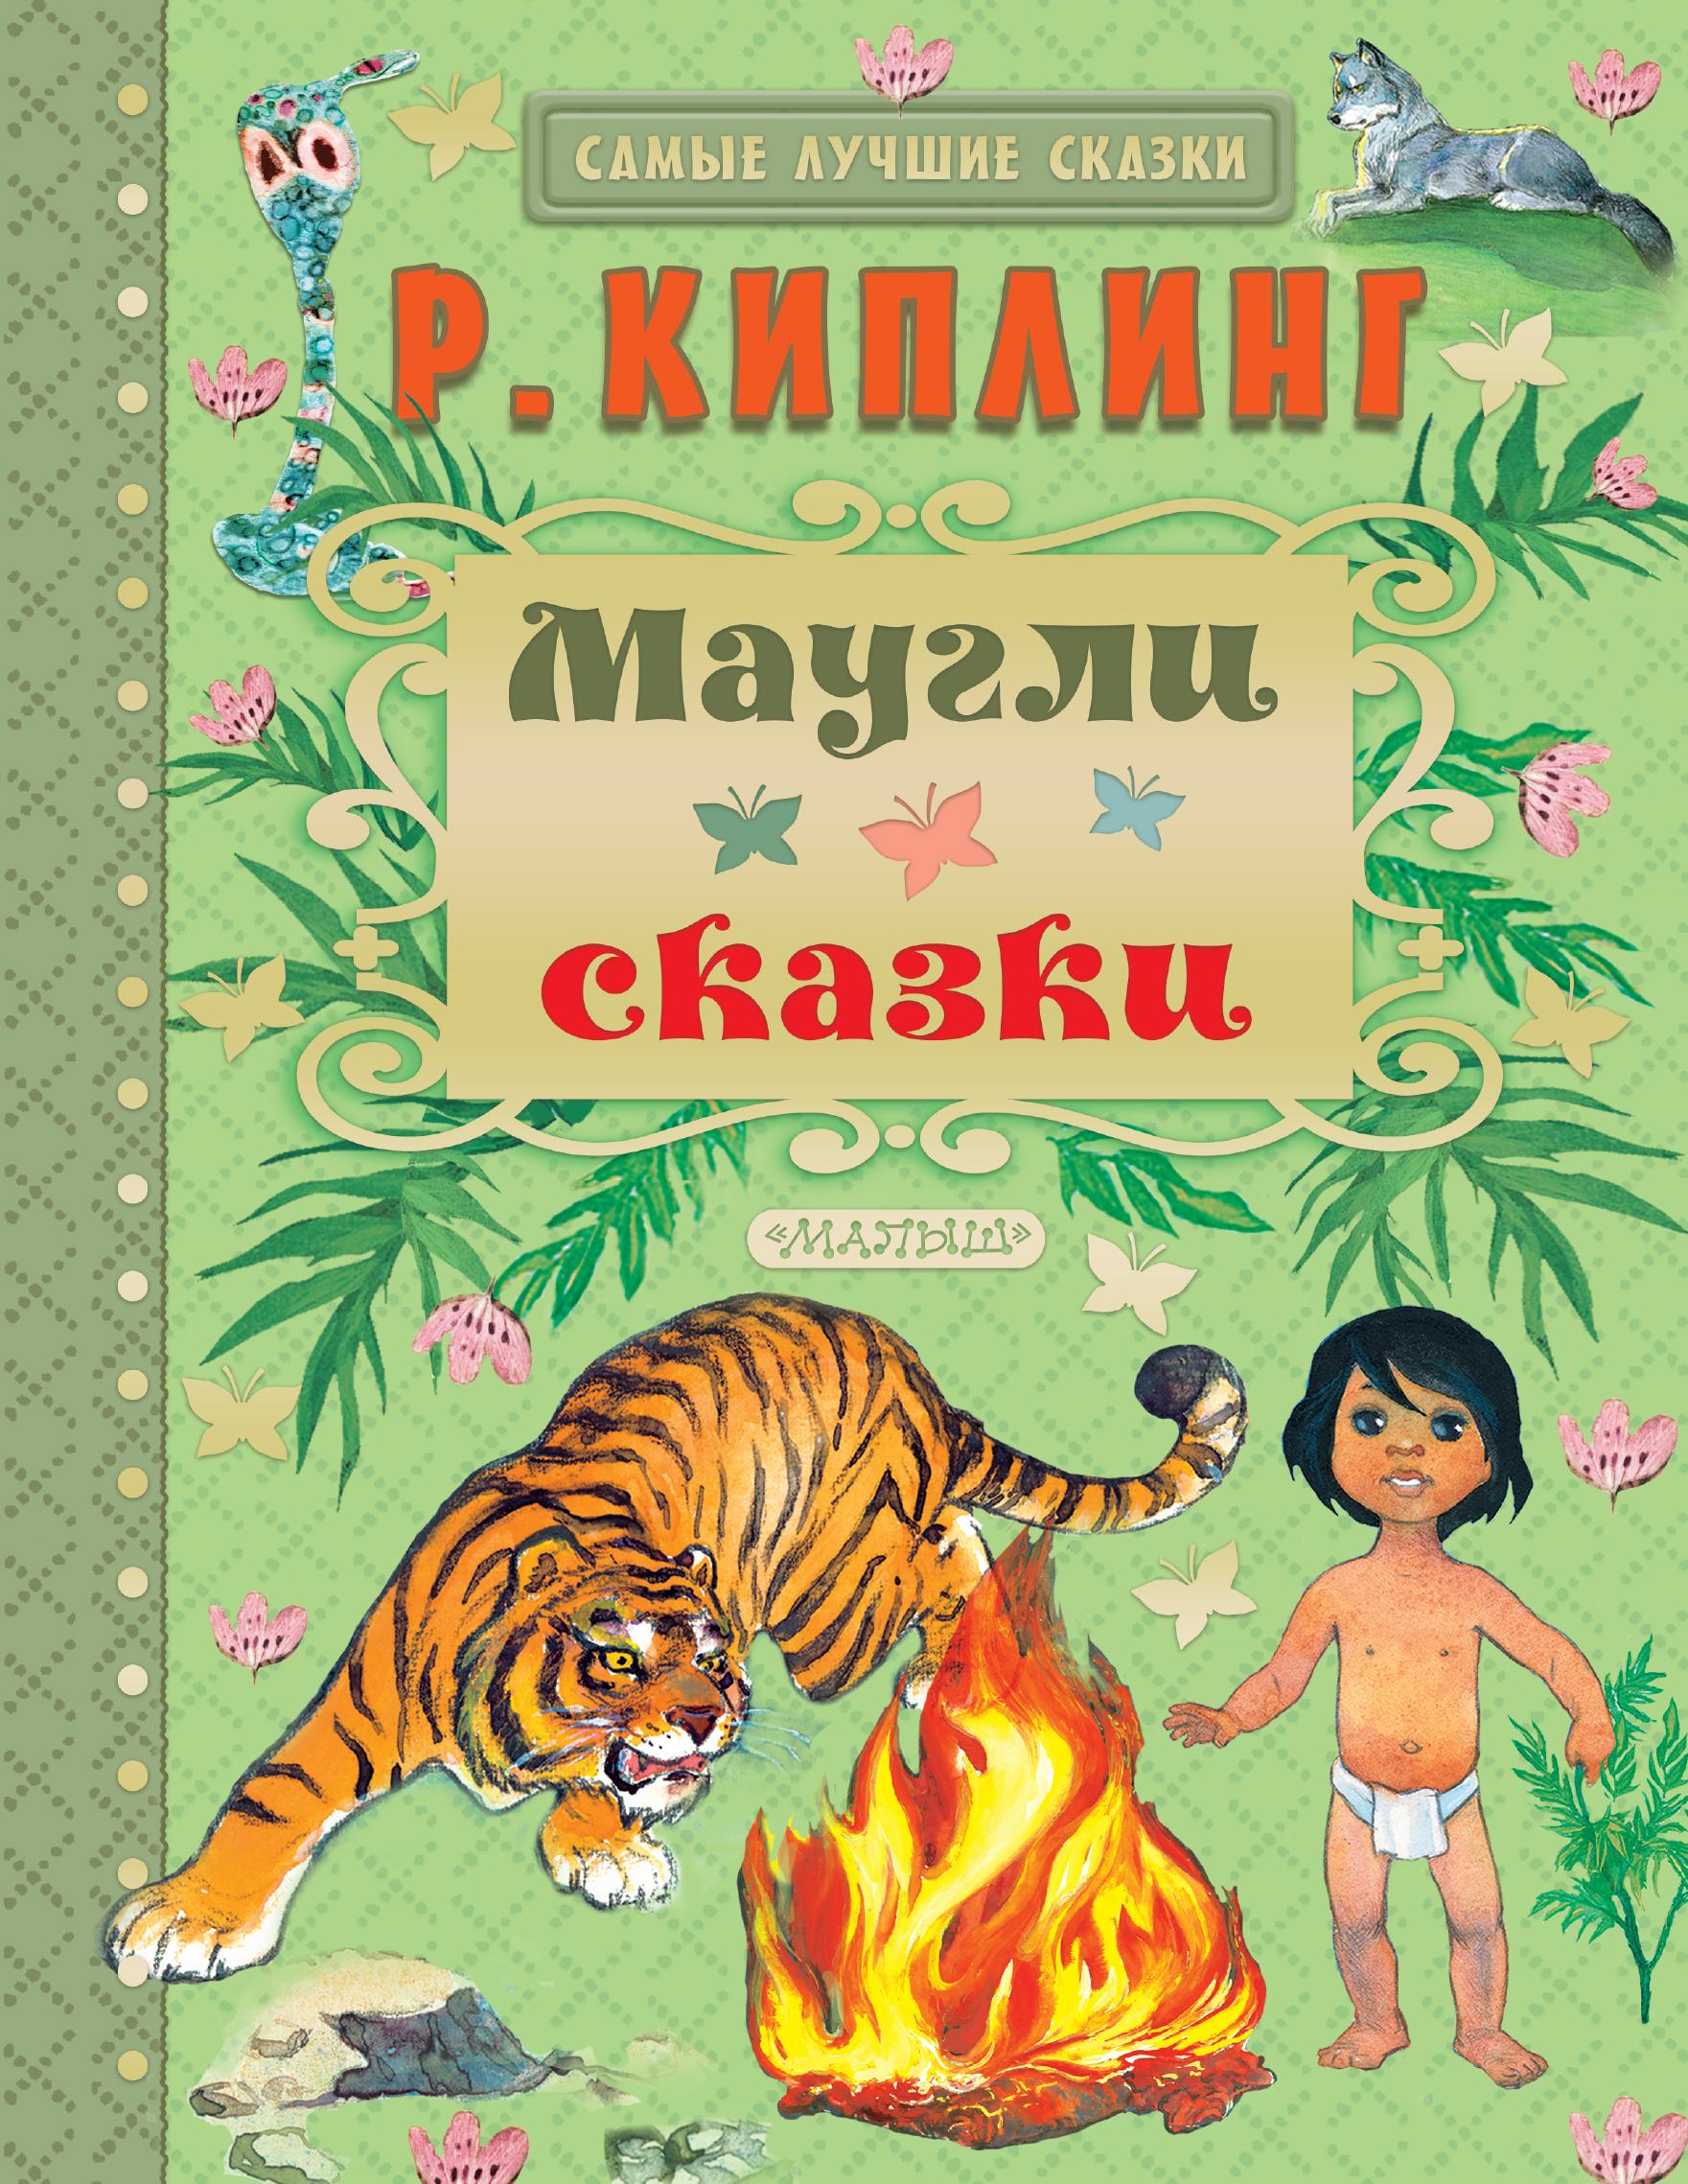 Киплинг Р.Д. Маугли. Сказки ISBN: 978-5-17-100763-8